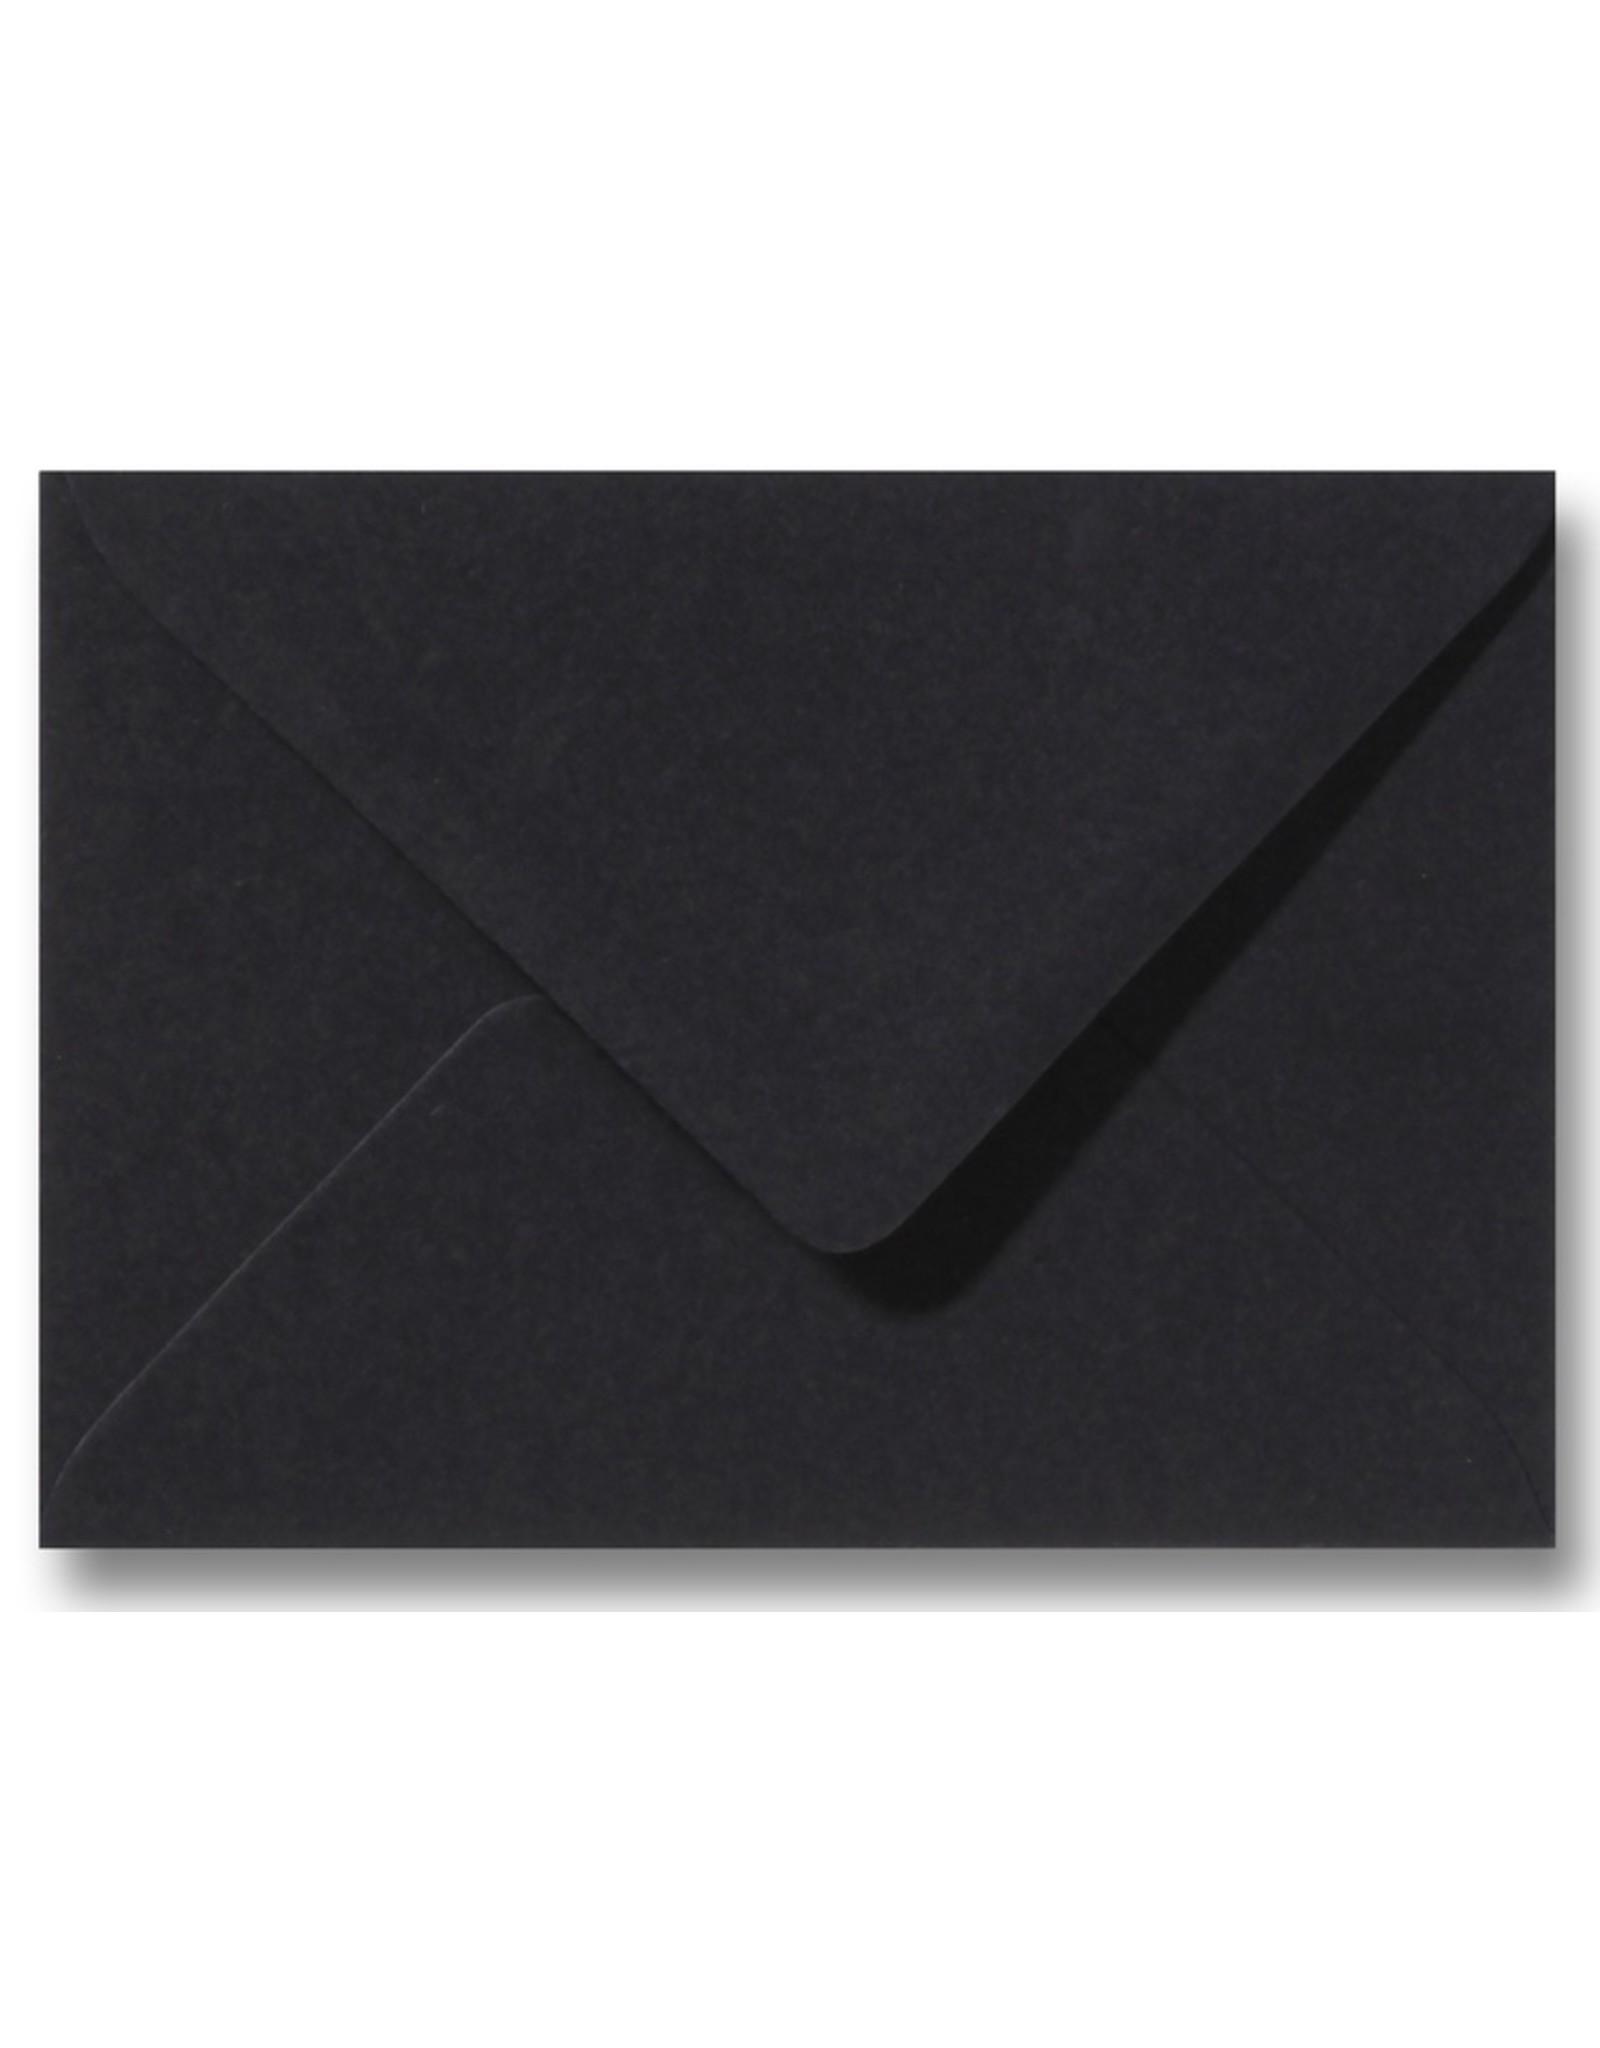 www.Robin.cards Blanco effen envelop Zwart